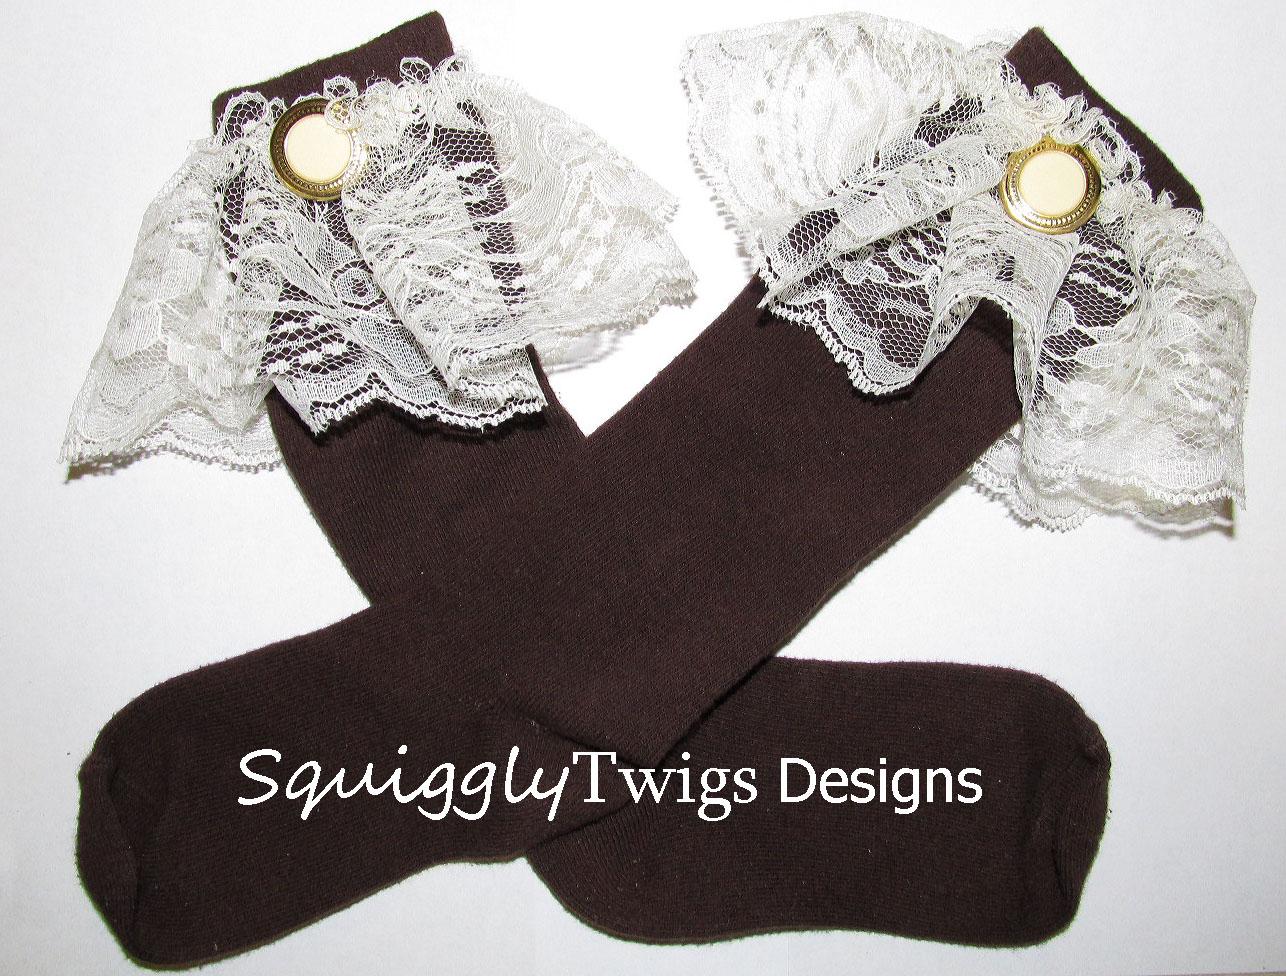 SquigglyTwigs Designs Tuesdays Tute Victorian Socks